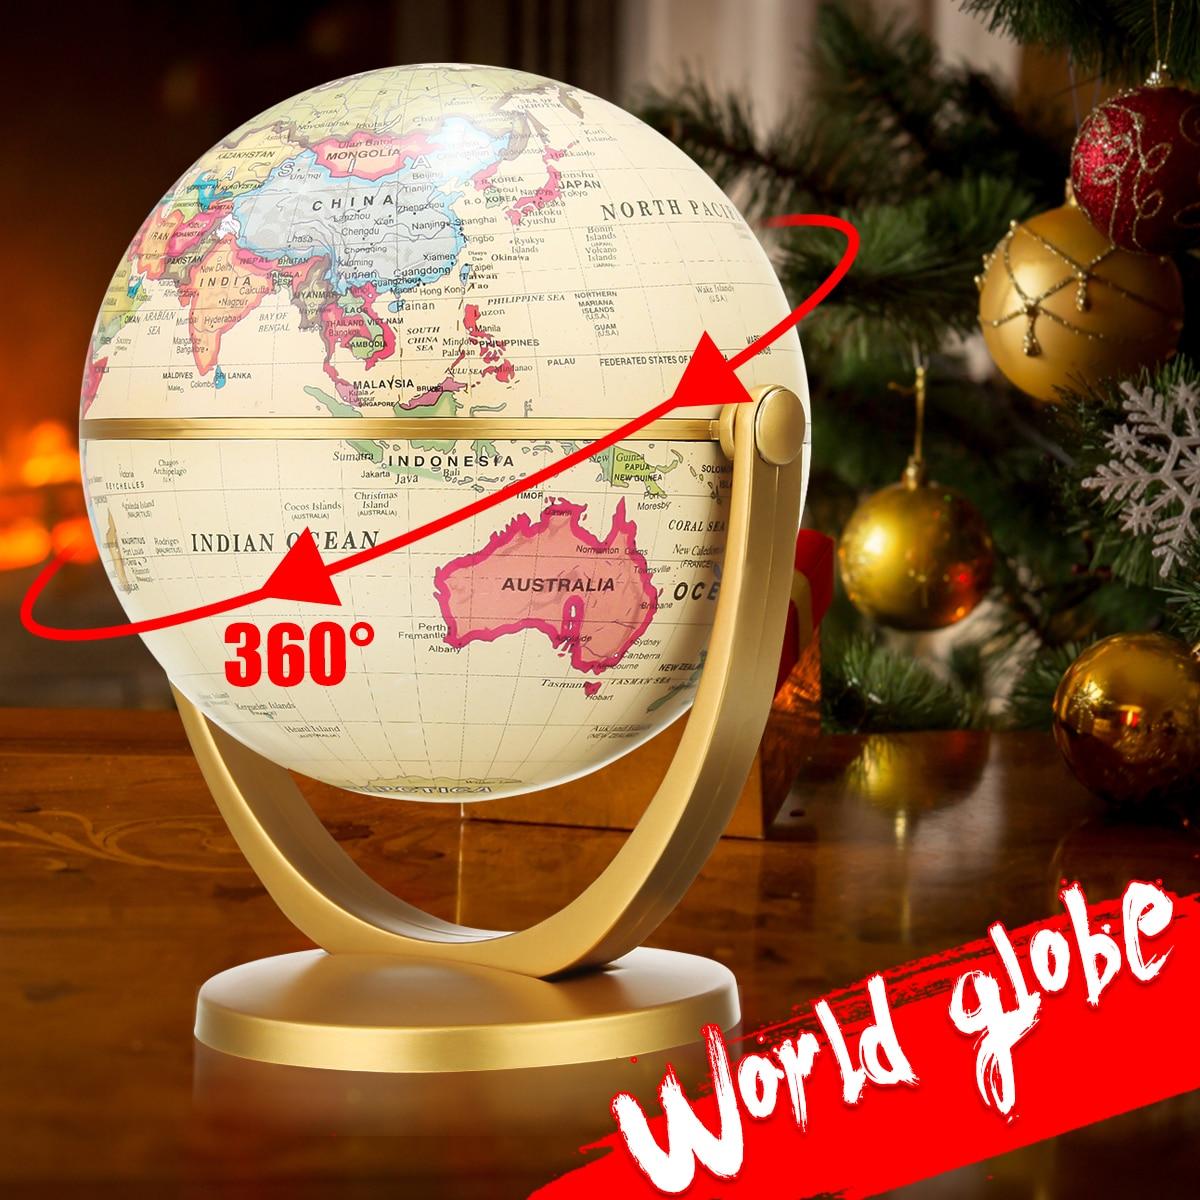 12cm Retro Globe 360 Rotating Earth World Ocean Map Ball Antique Desktop Geography Learning Education Home School Decoration